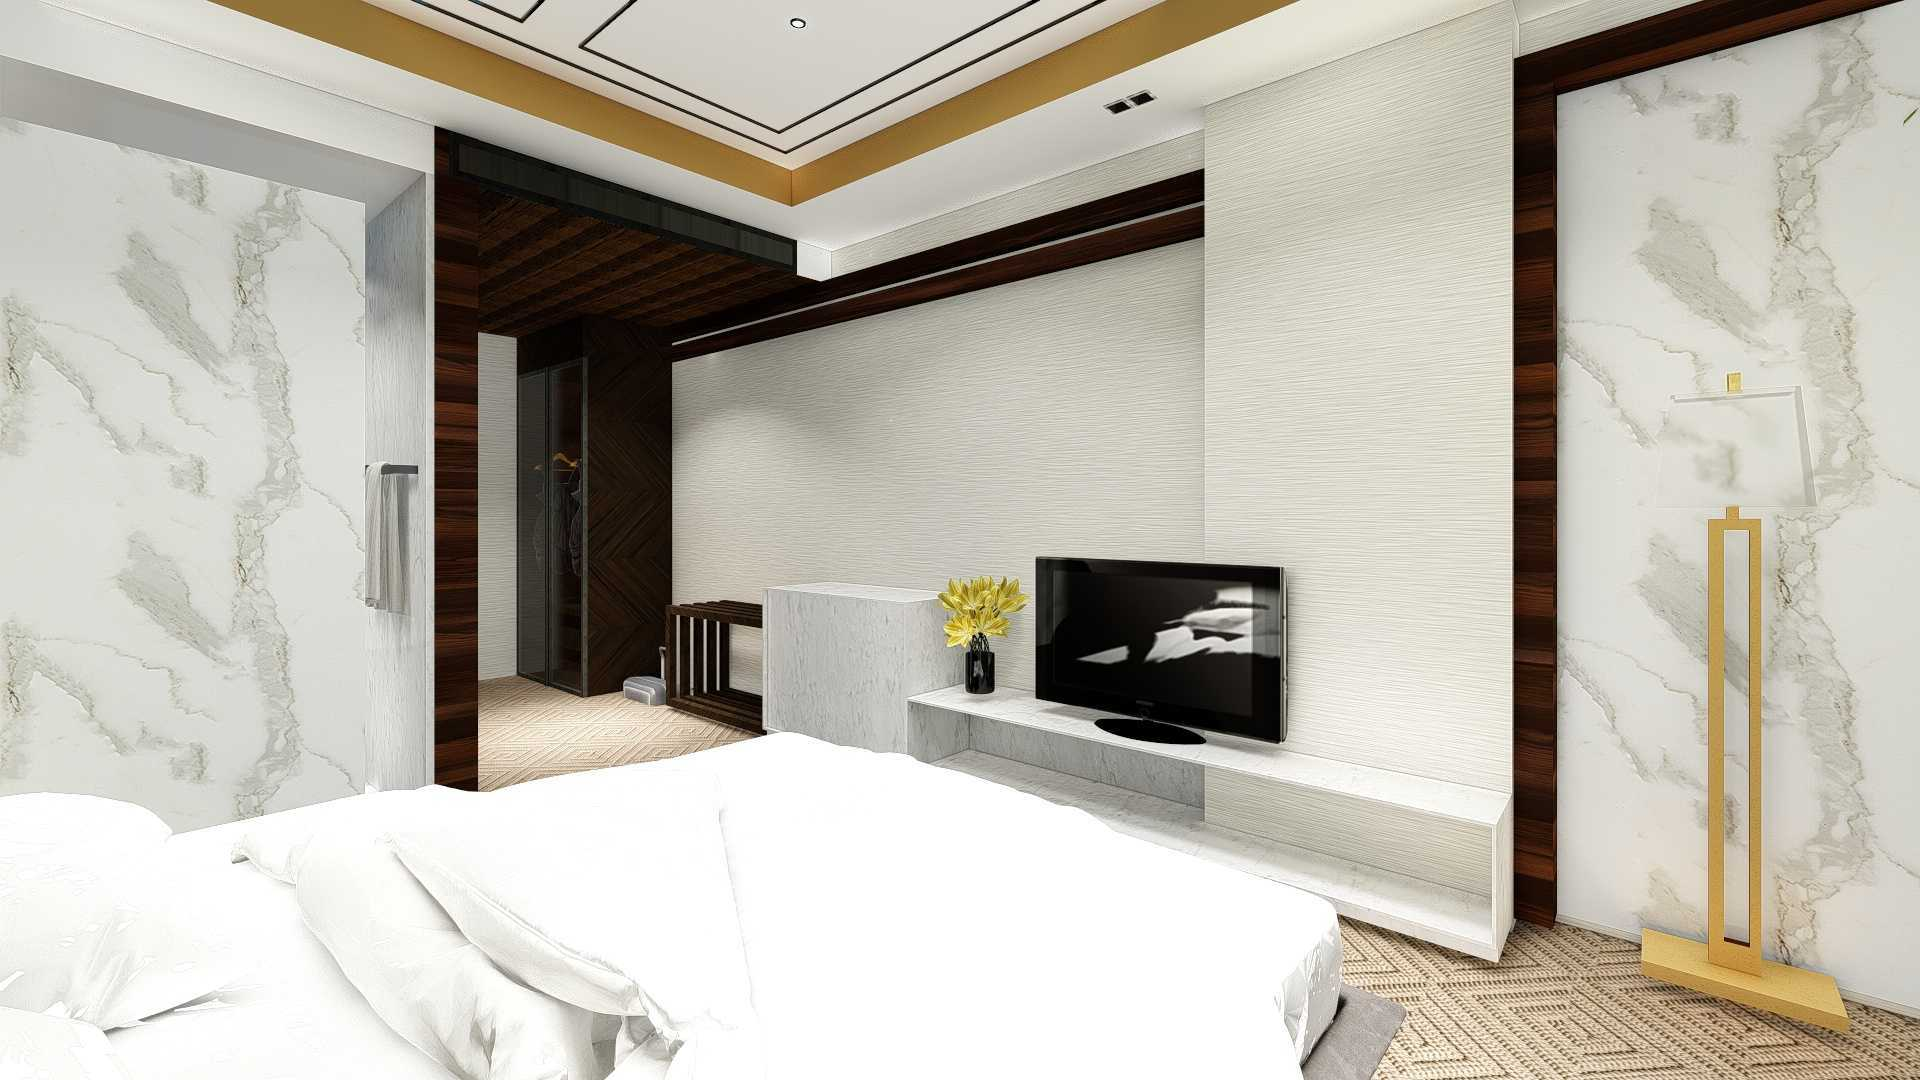 Samitrayasa Design Luxury Hotel Room Alternative 3 Jl. Kemang Raya, Bangka, Mampang Prpt., Kota Jakarta Selatan, Daerah Khusus Ibukota Jakarta, Indonesia  11008 Modern  32665